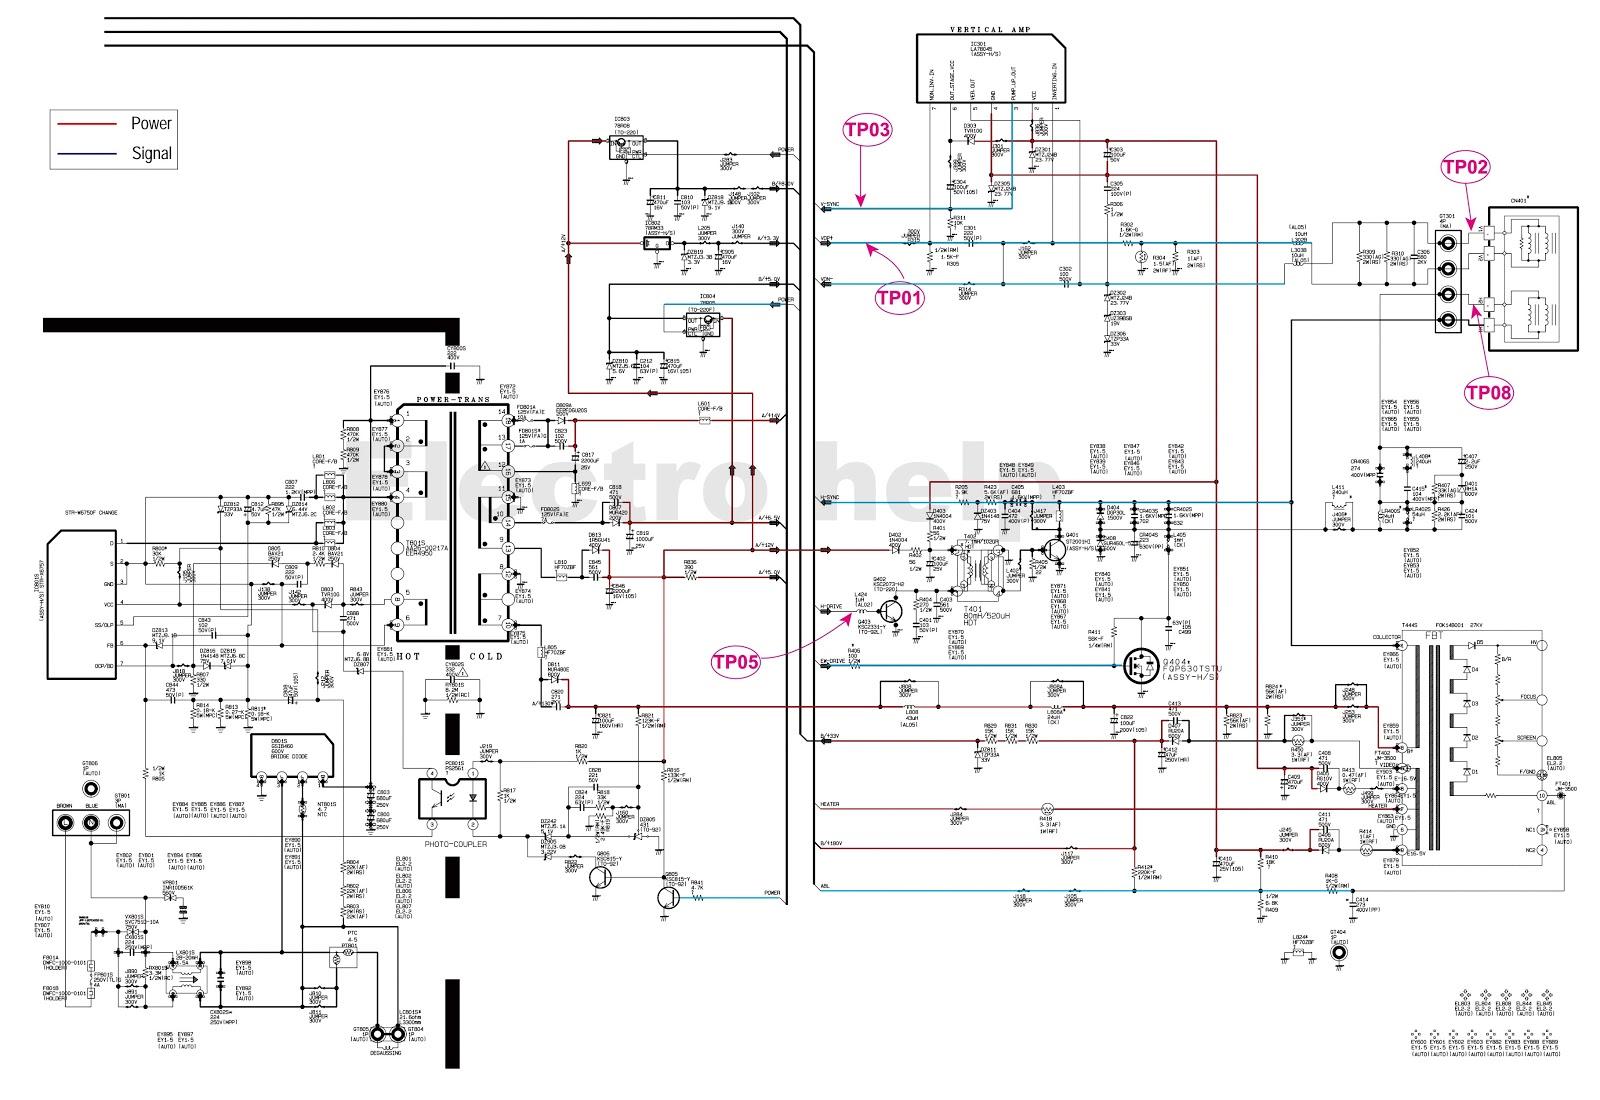 tv tuner card circuit diagram bird life cycle samsung cw21z413ncxxec crt